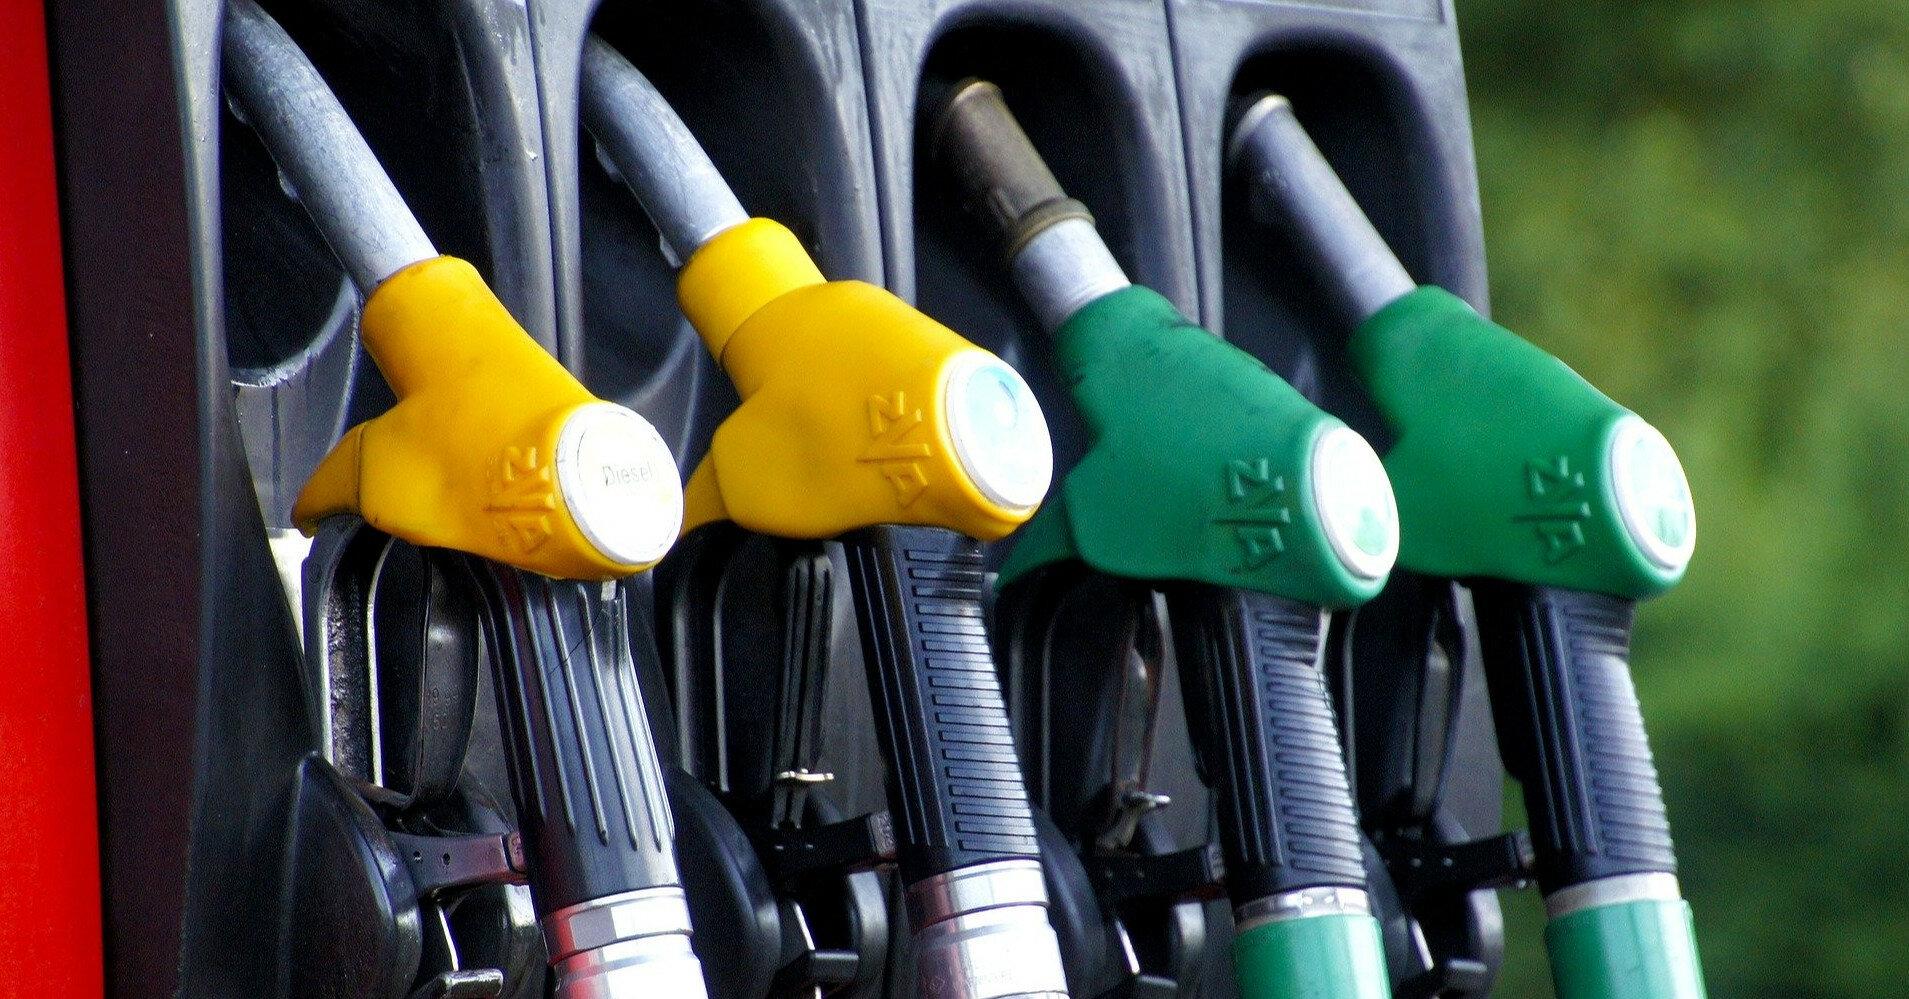 Цены на бензин возобновили рост